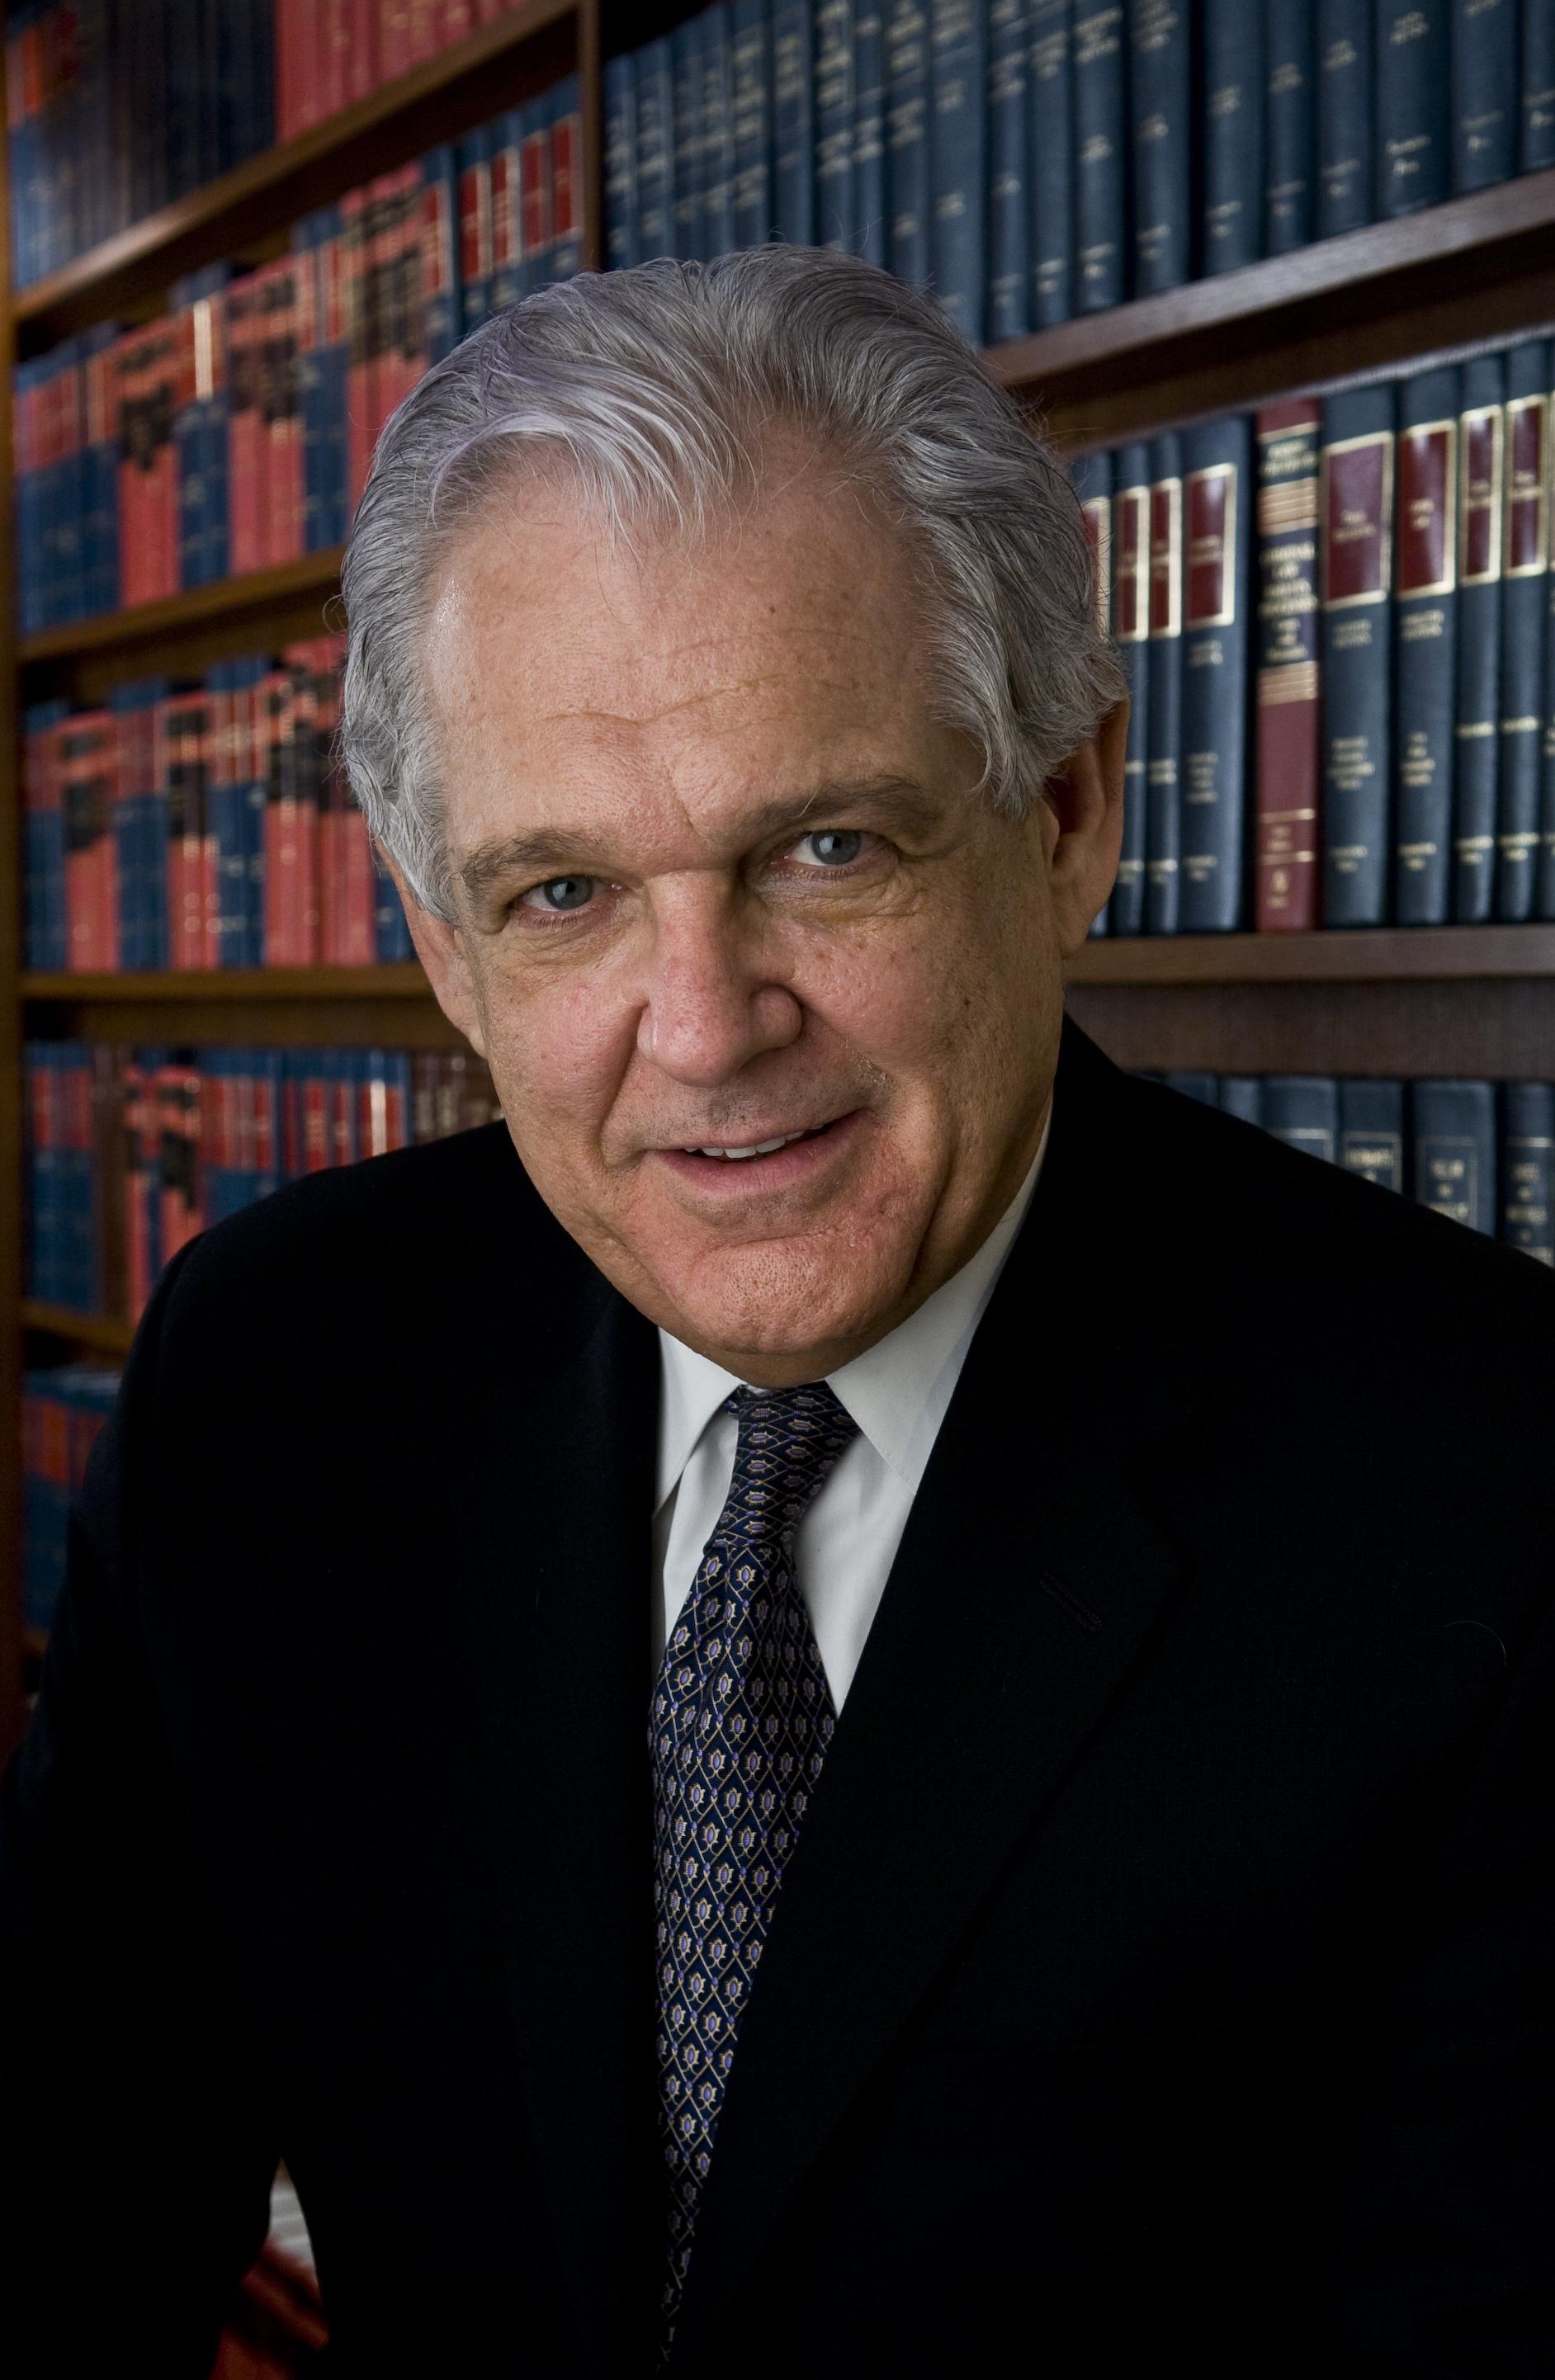 Prof. George Bermann